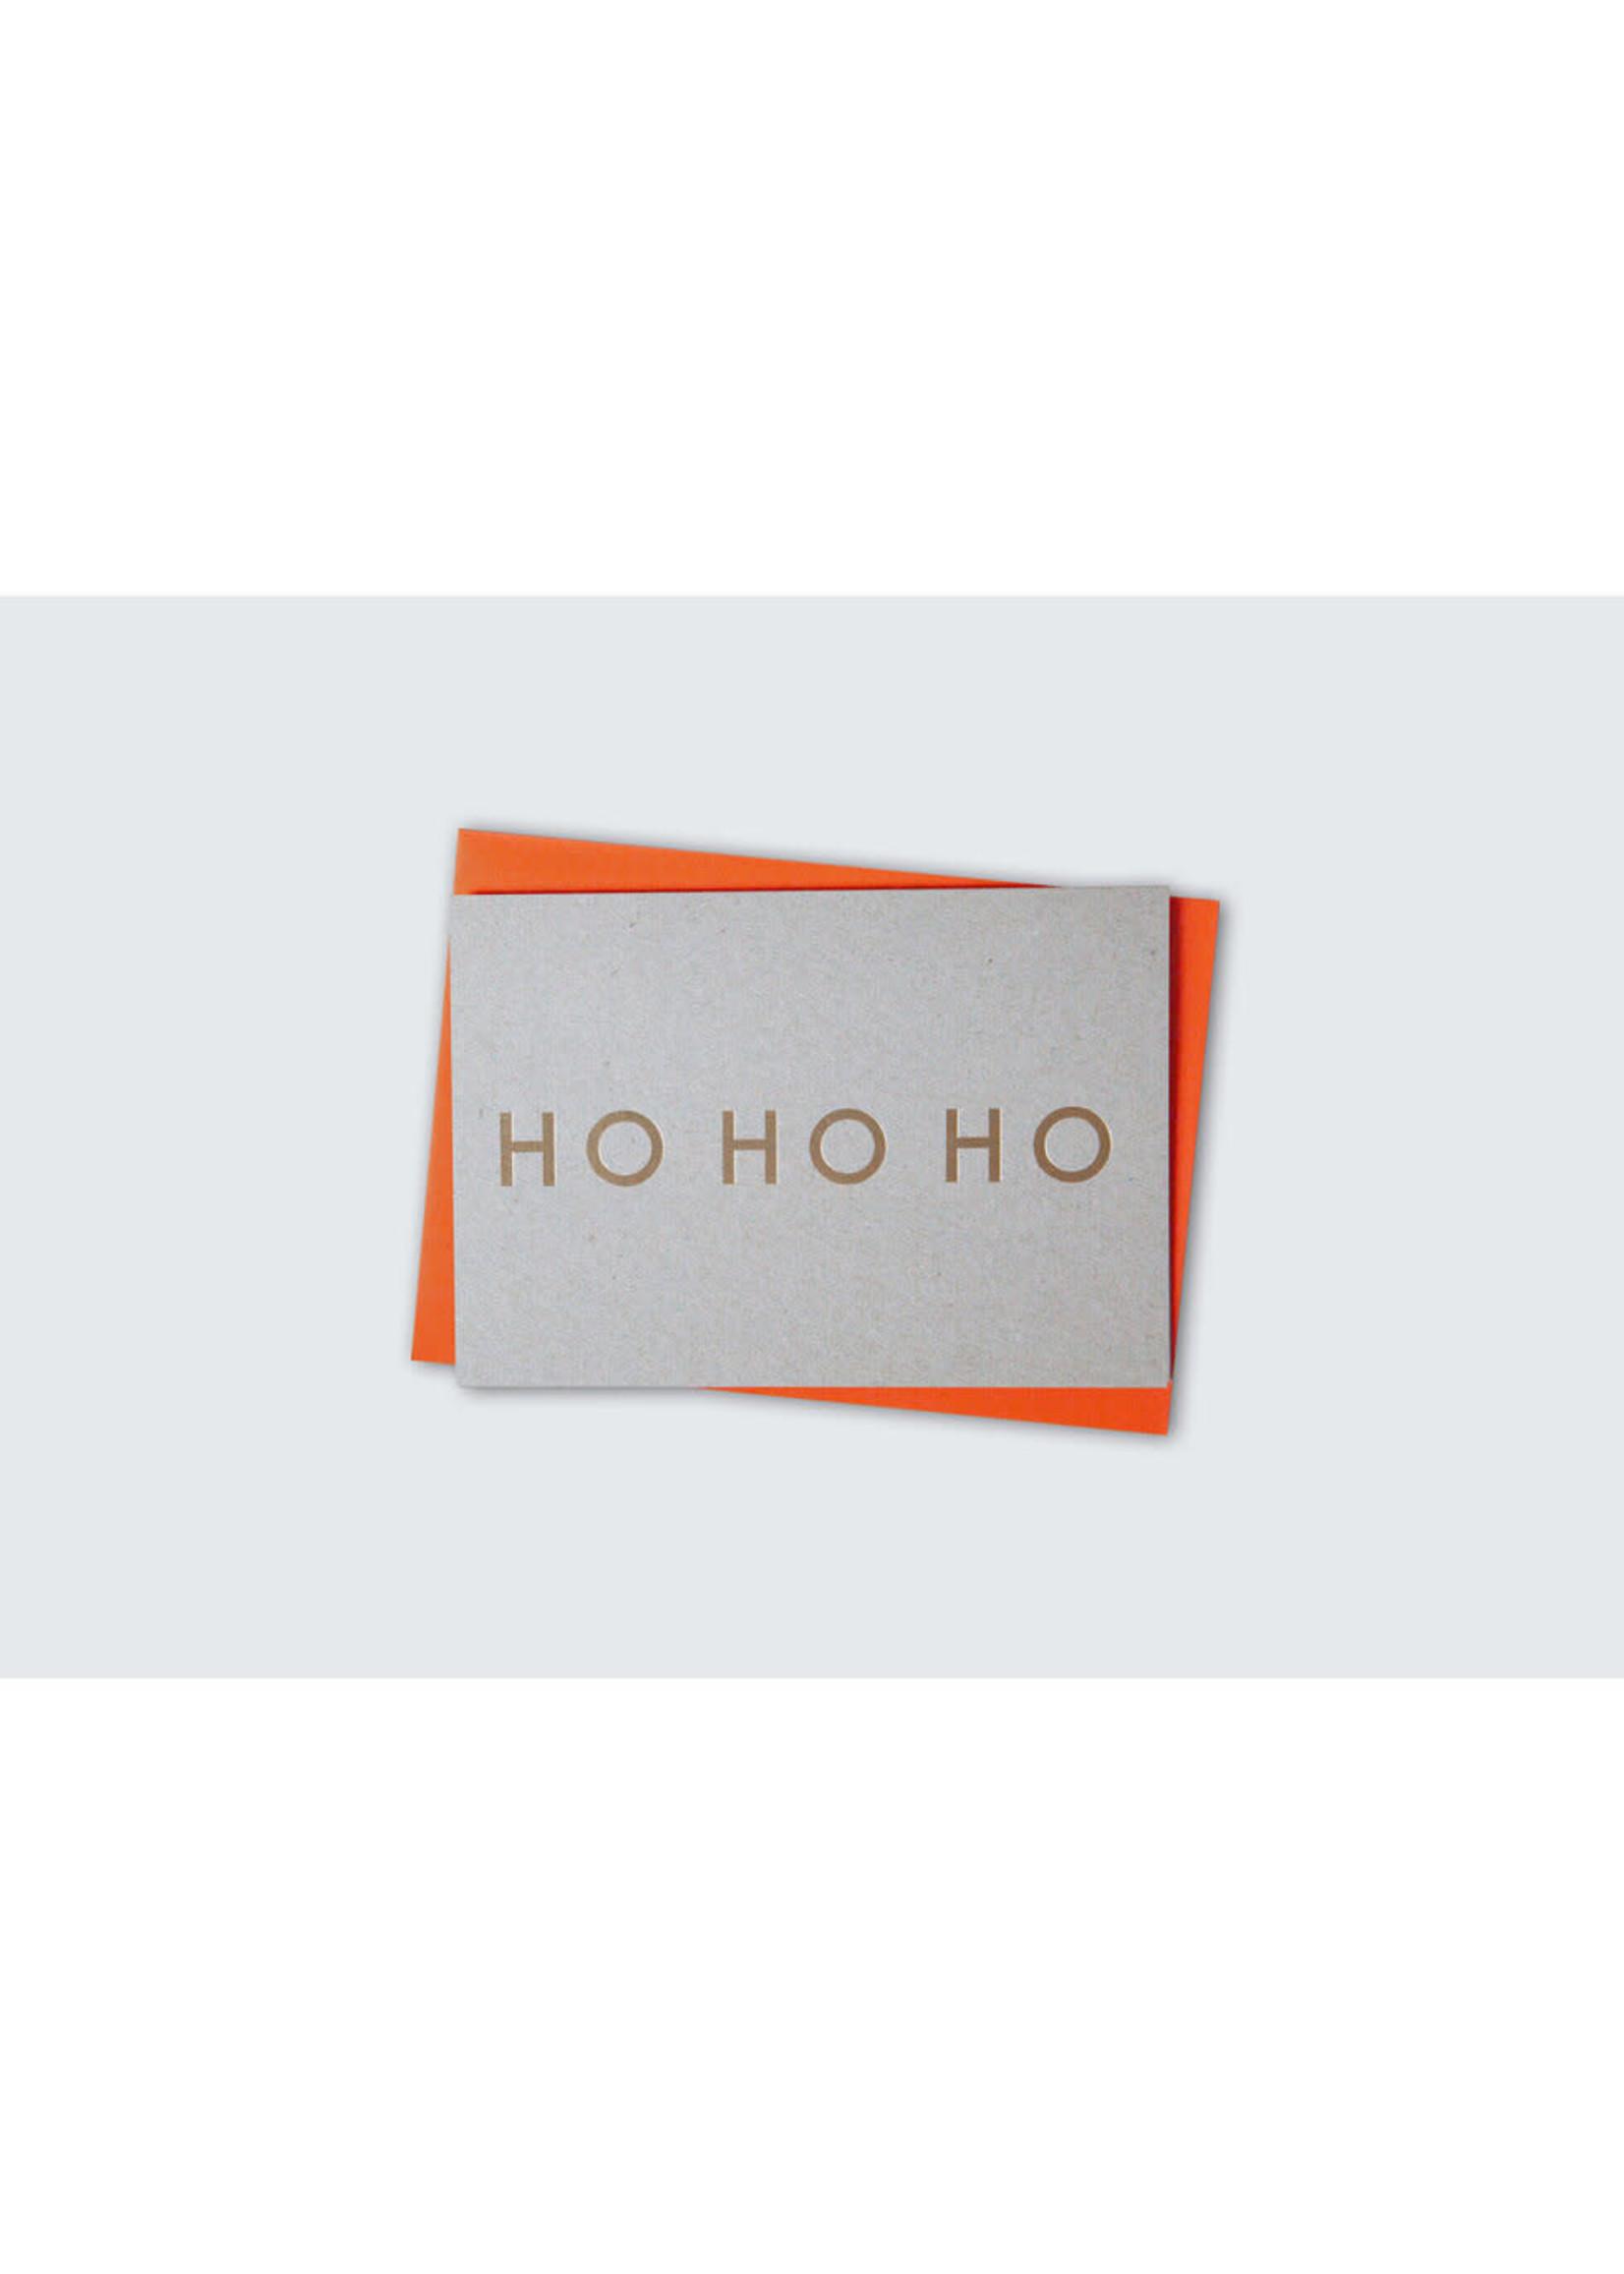 Ola Ola Foil Blocked Fluorescent Cards: HO HO HO Brass on Grey